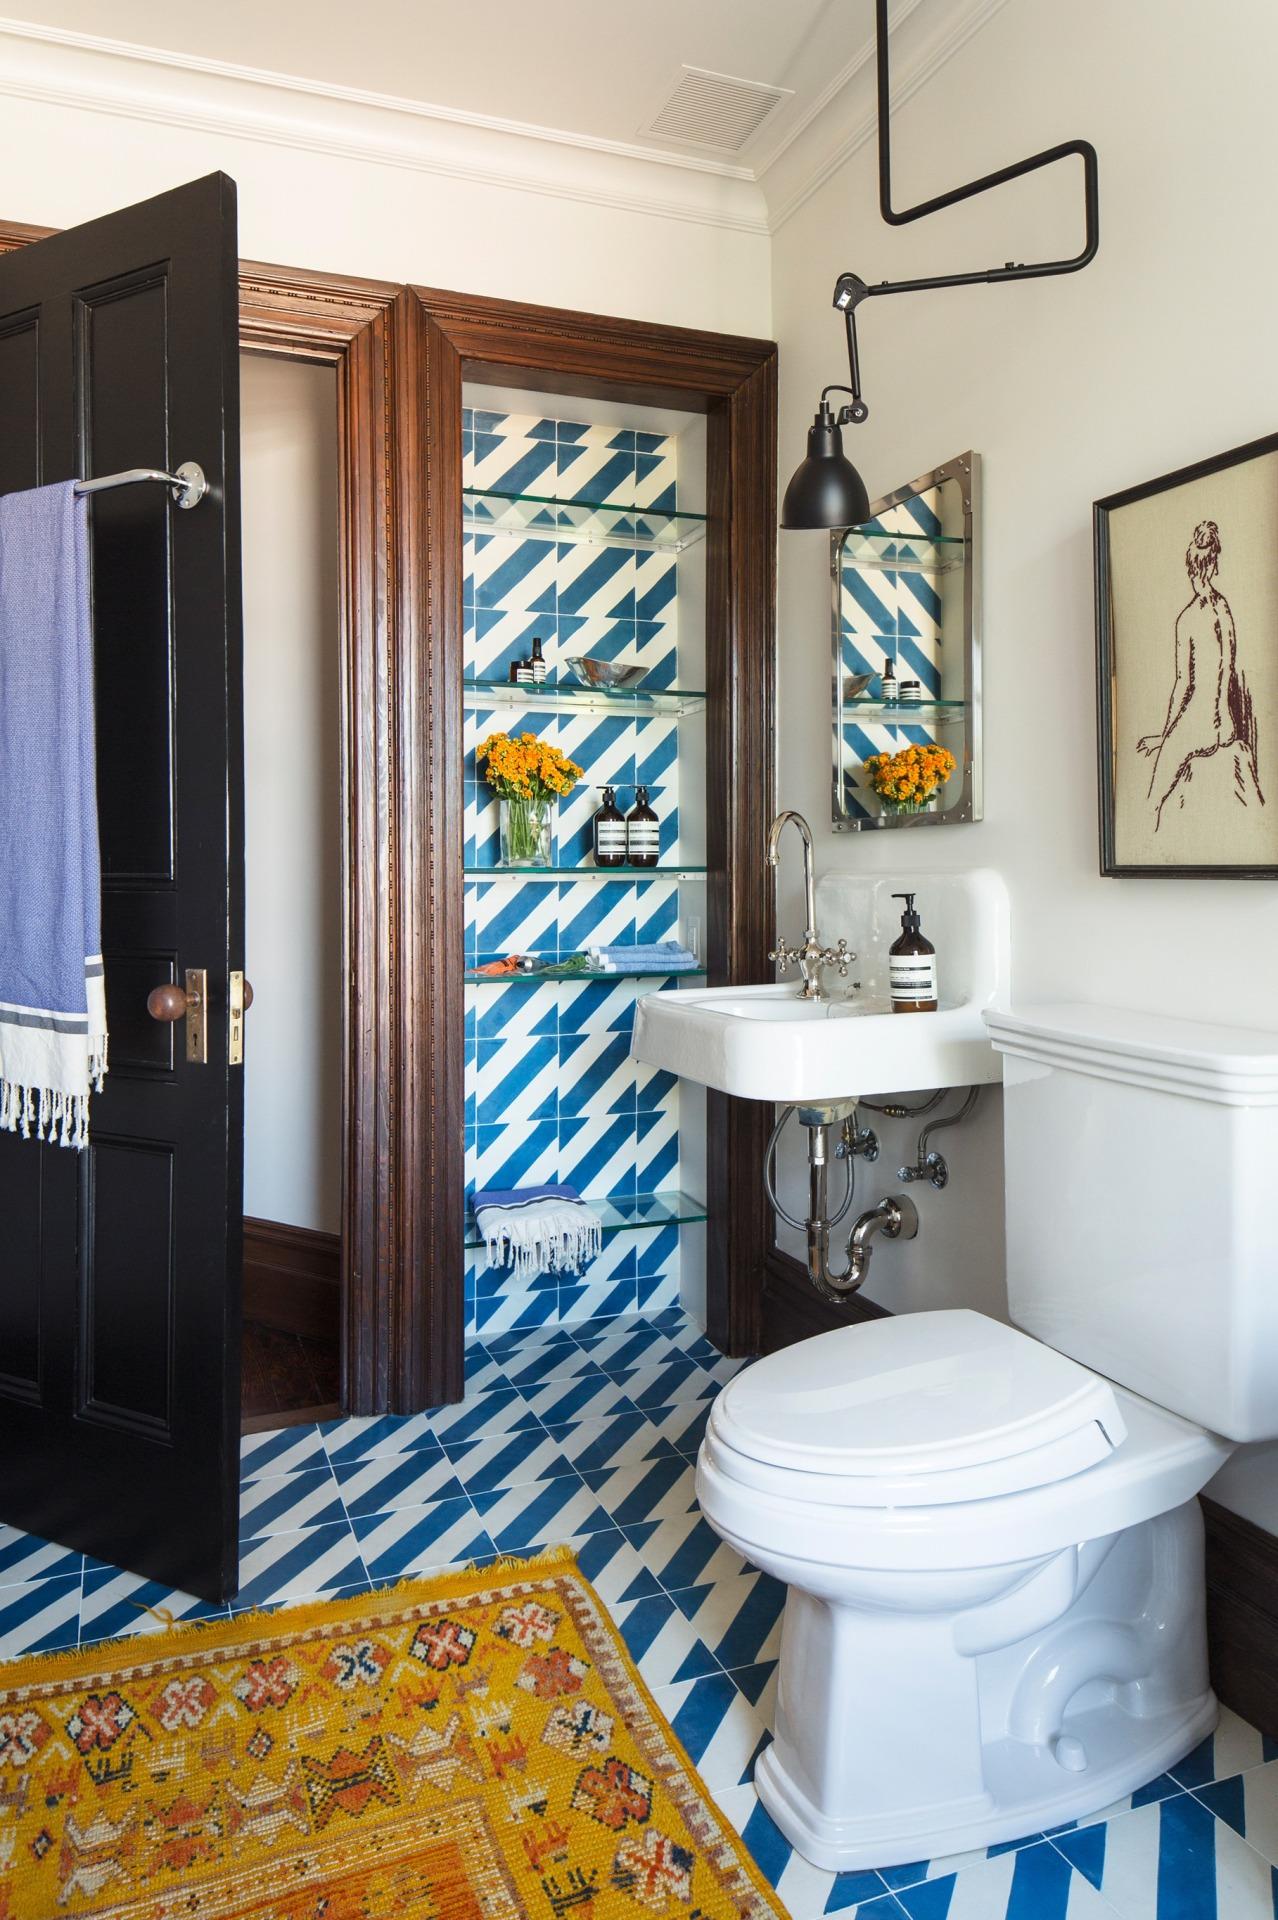 The Nordroom - 25 Inspiring Bathrooms With Geometric Tiles  image: Elizabeth Roberts